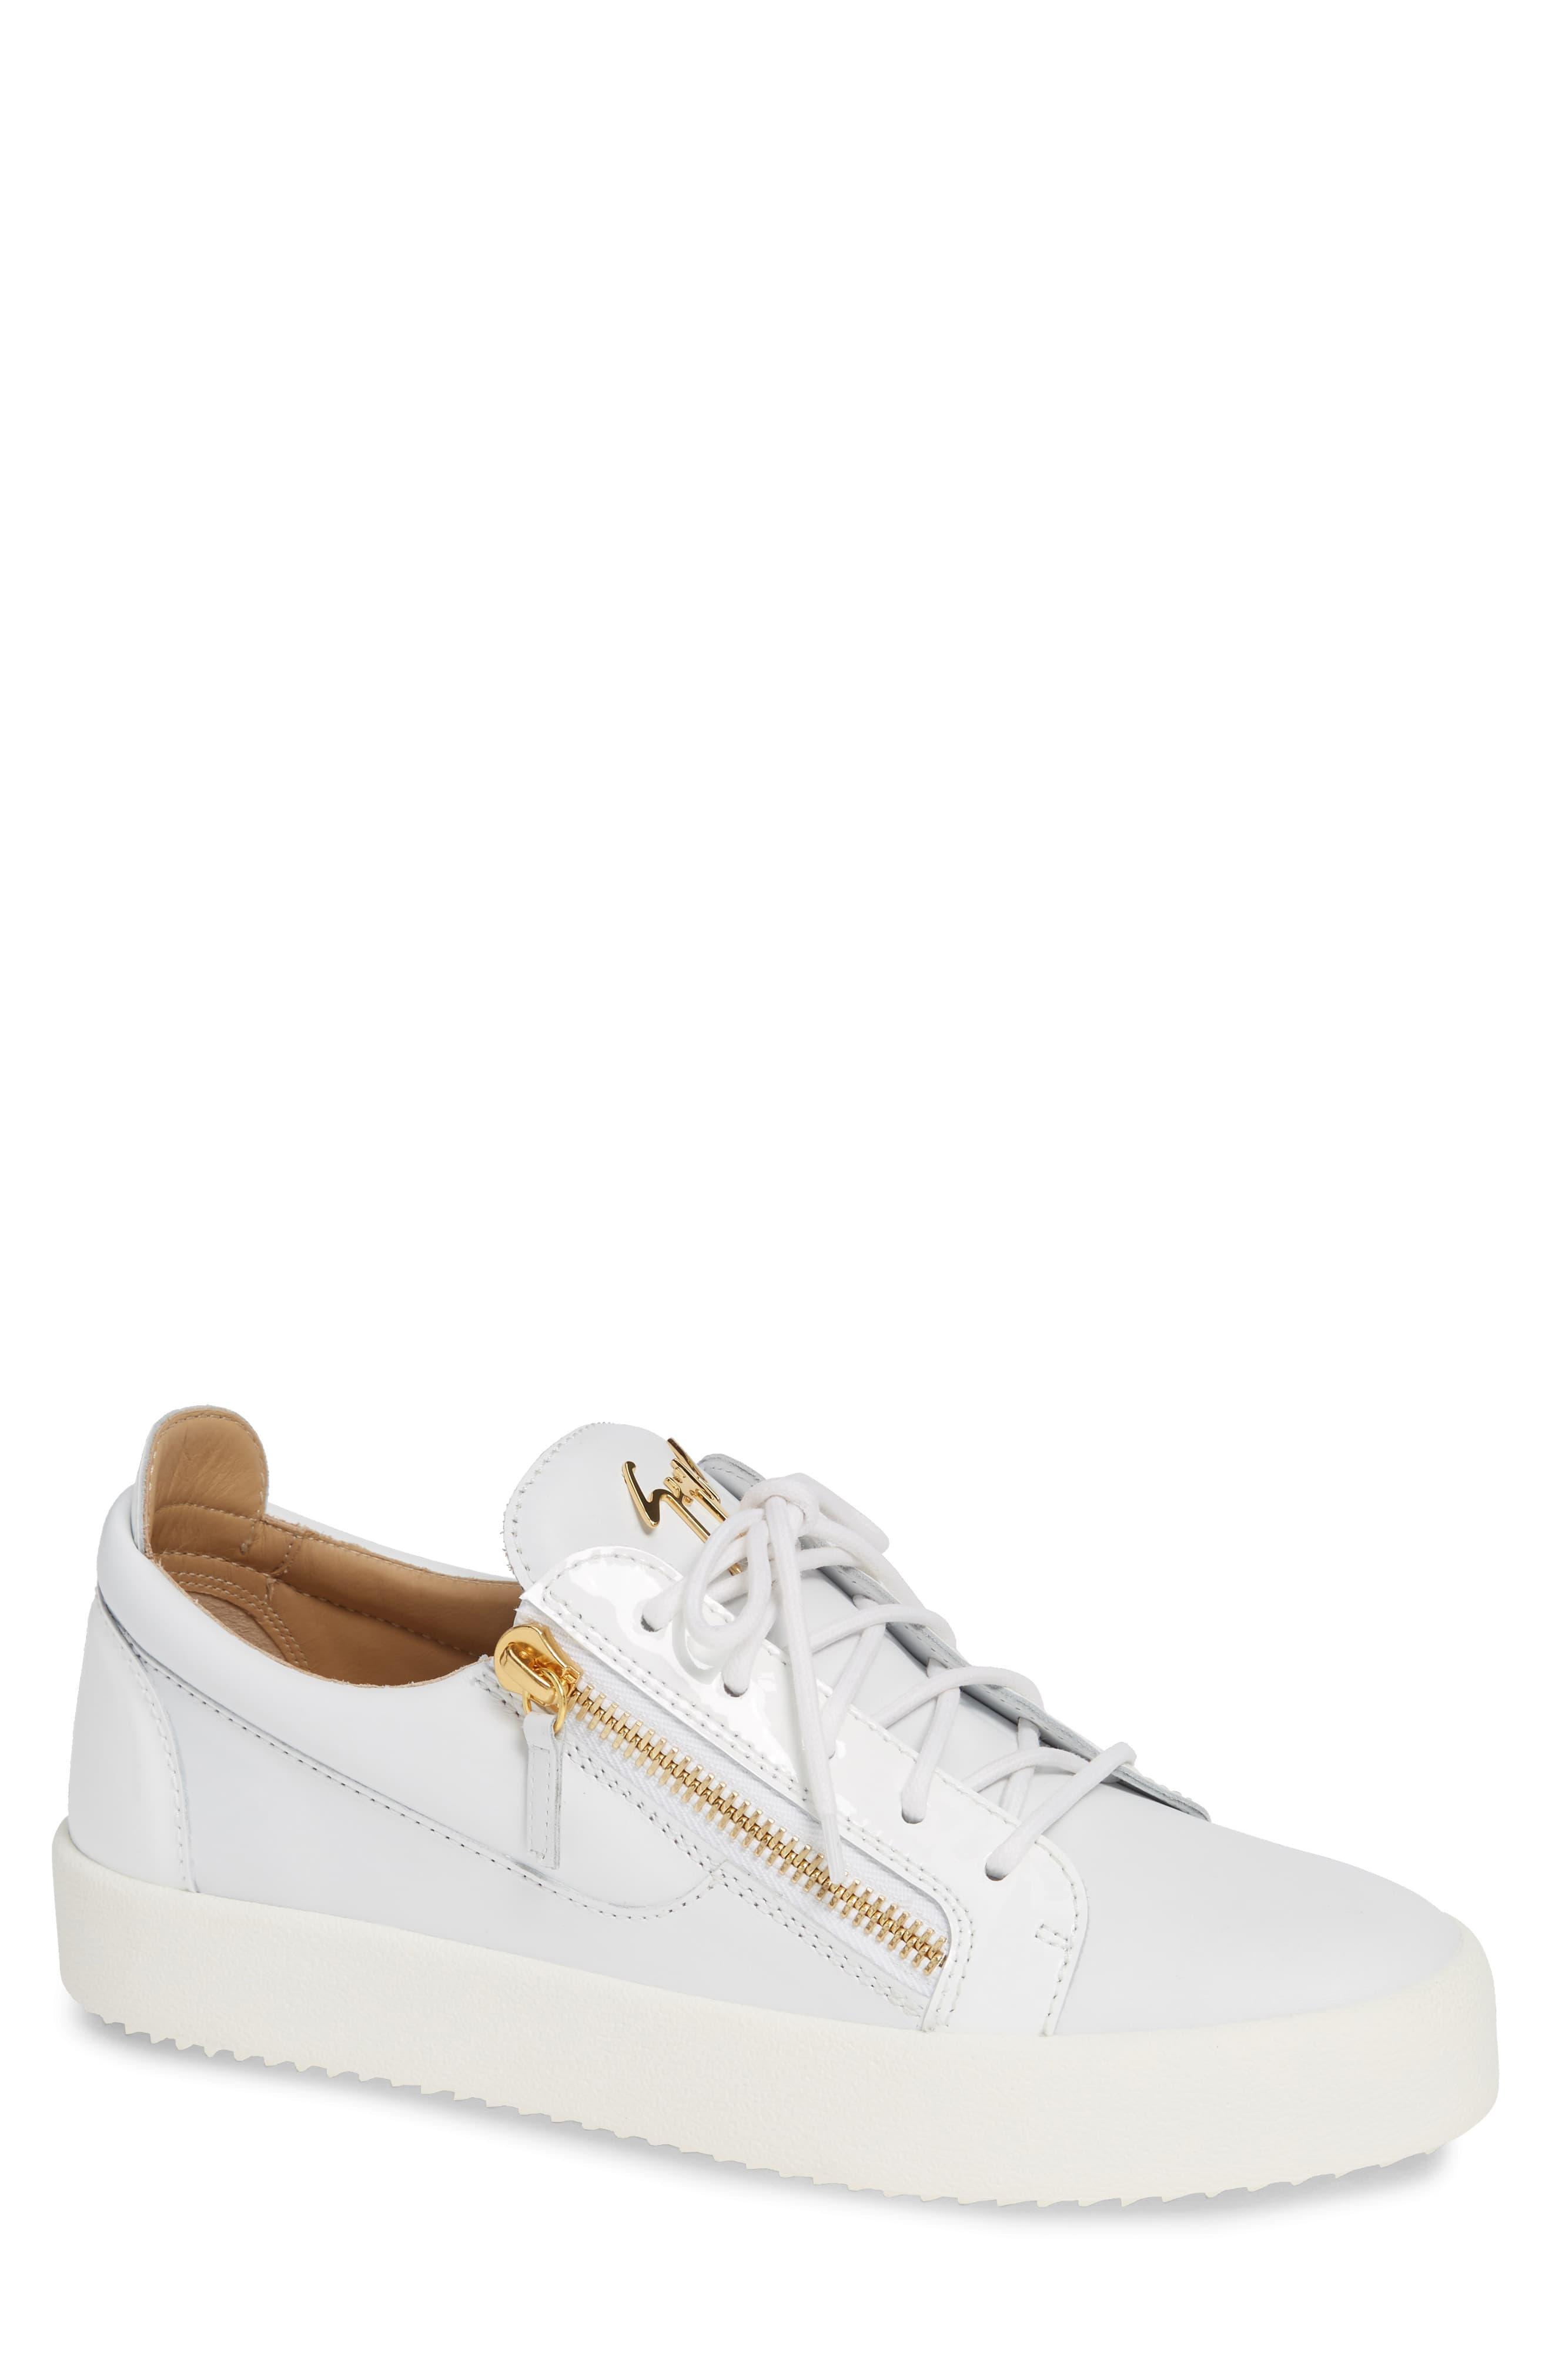 becebe7c5dcc7 Men's Giuseppe Zanotti Low Top Sneaker, Size 40 EU - White in 2019 ...